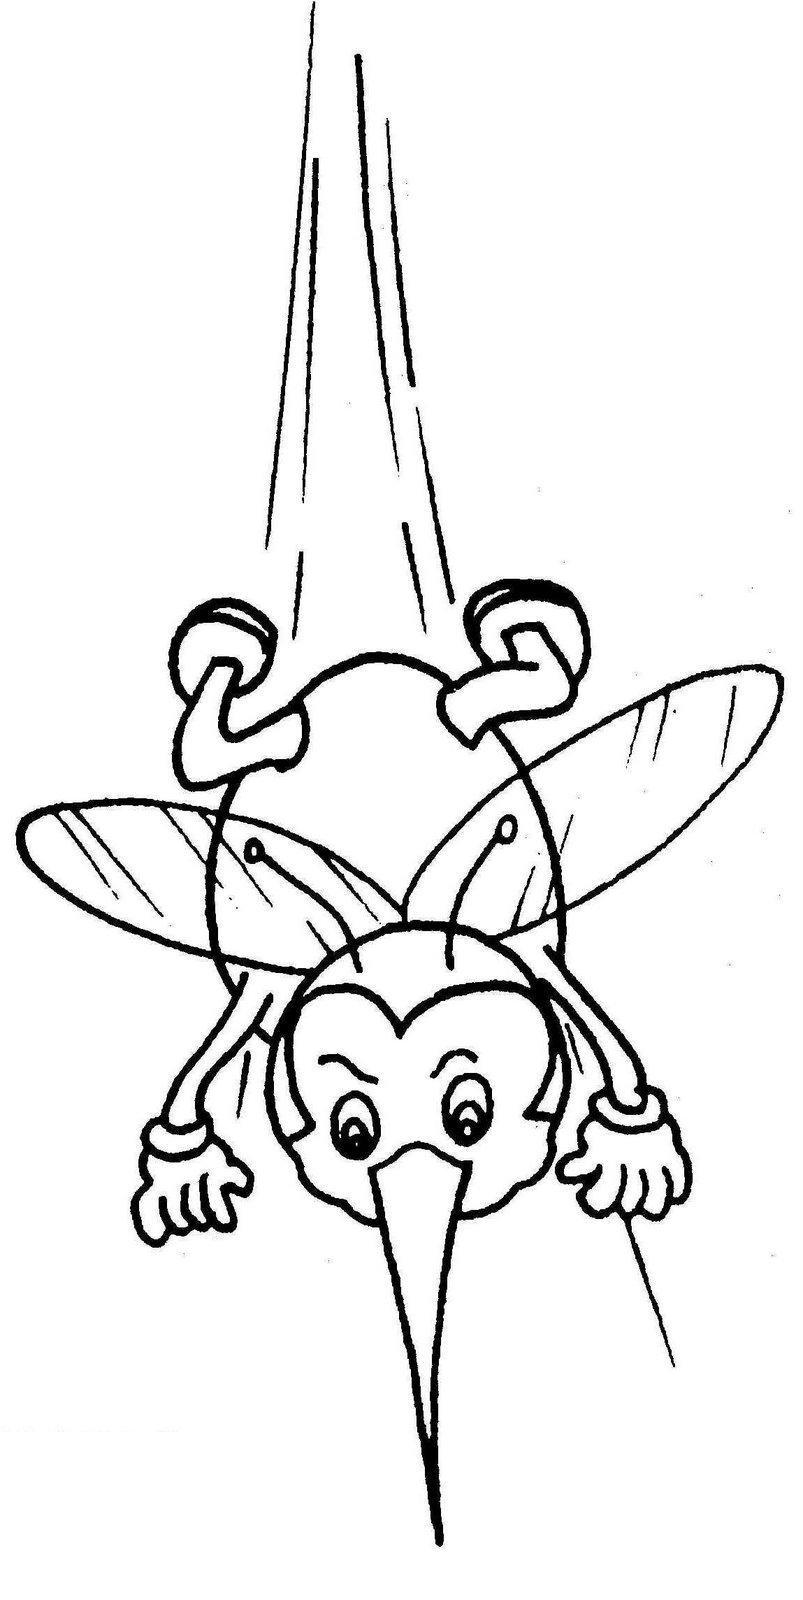 Mosquito Da Dengue Sketch Coloring Page